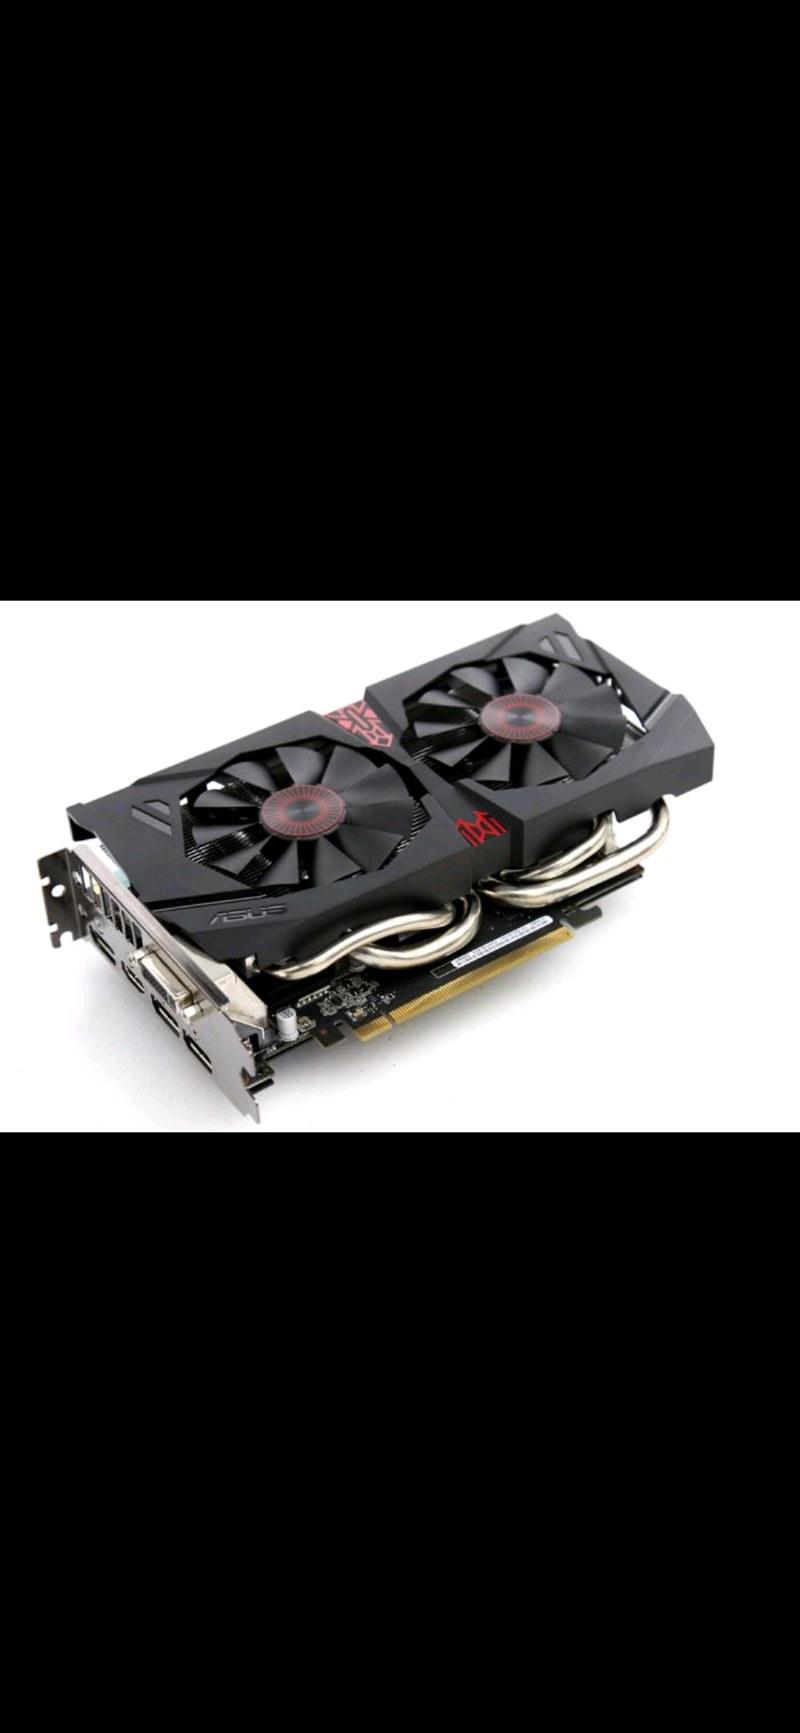 ASUS GTX 960 ROG STRIX OC 4 GB